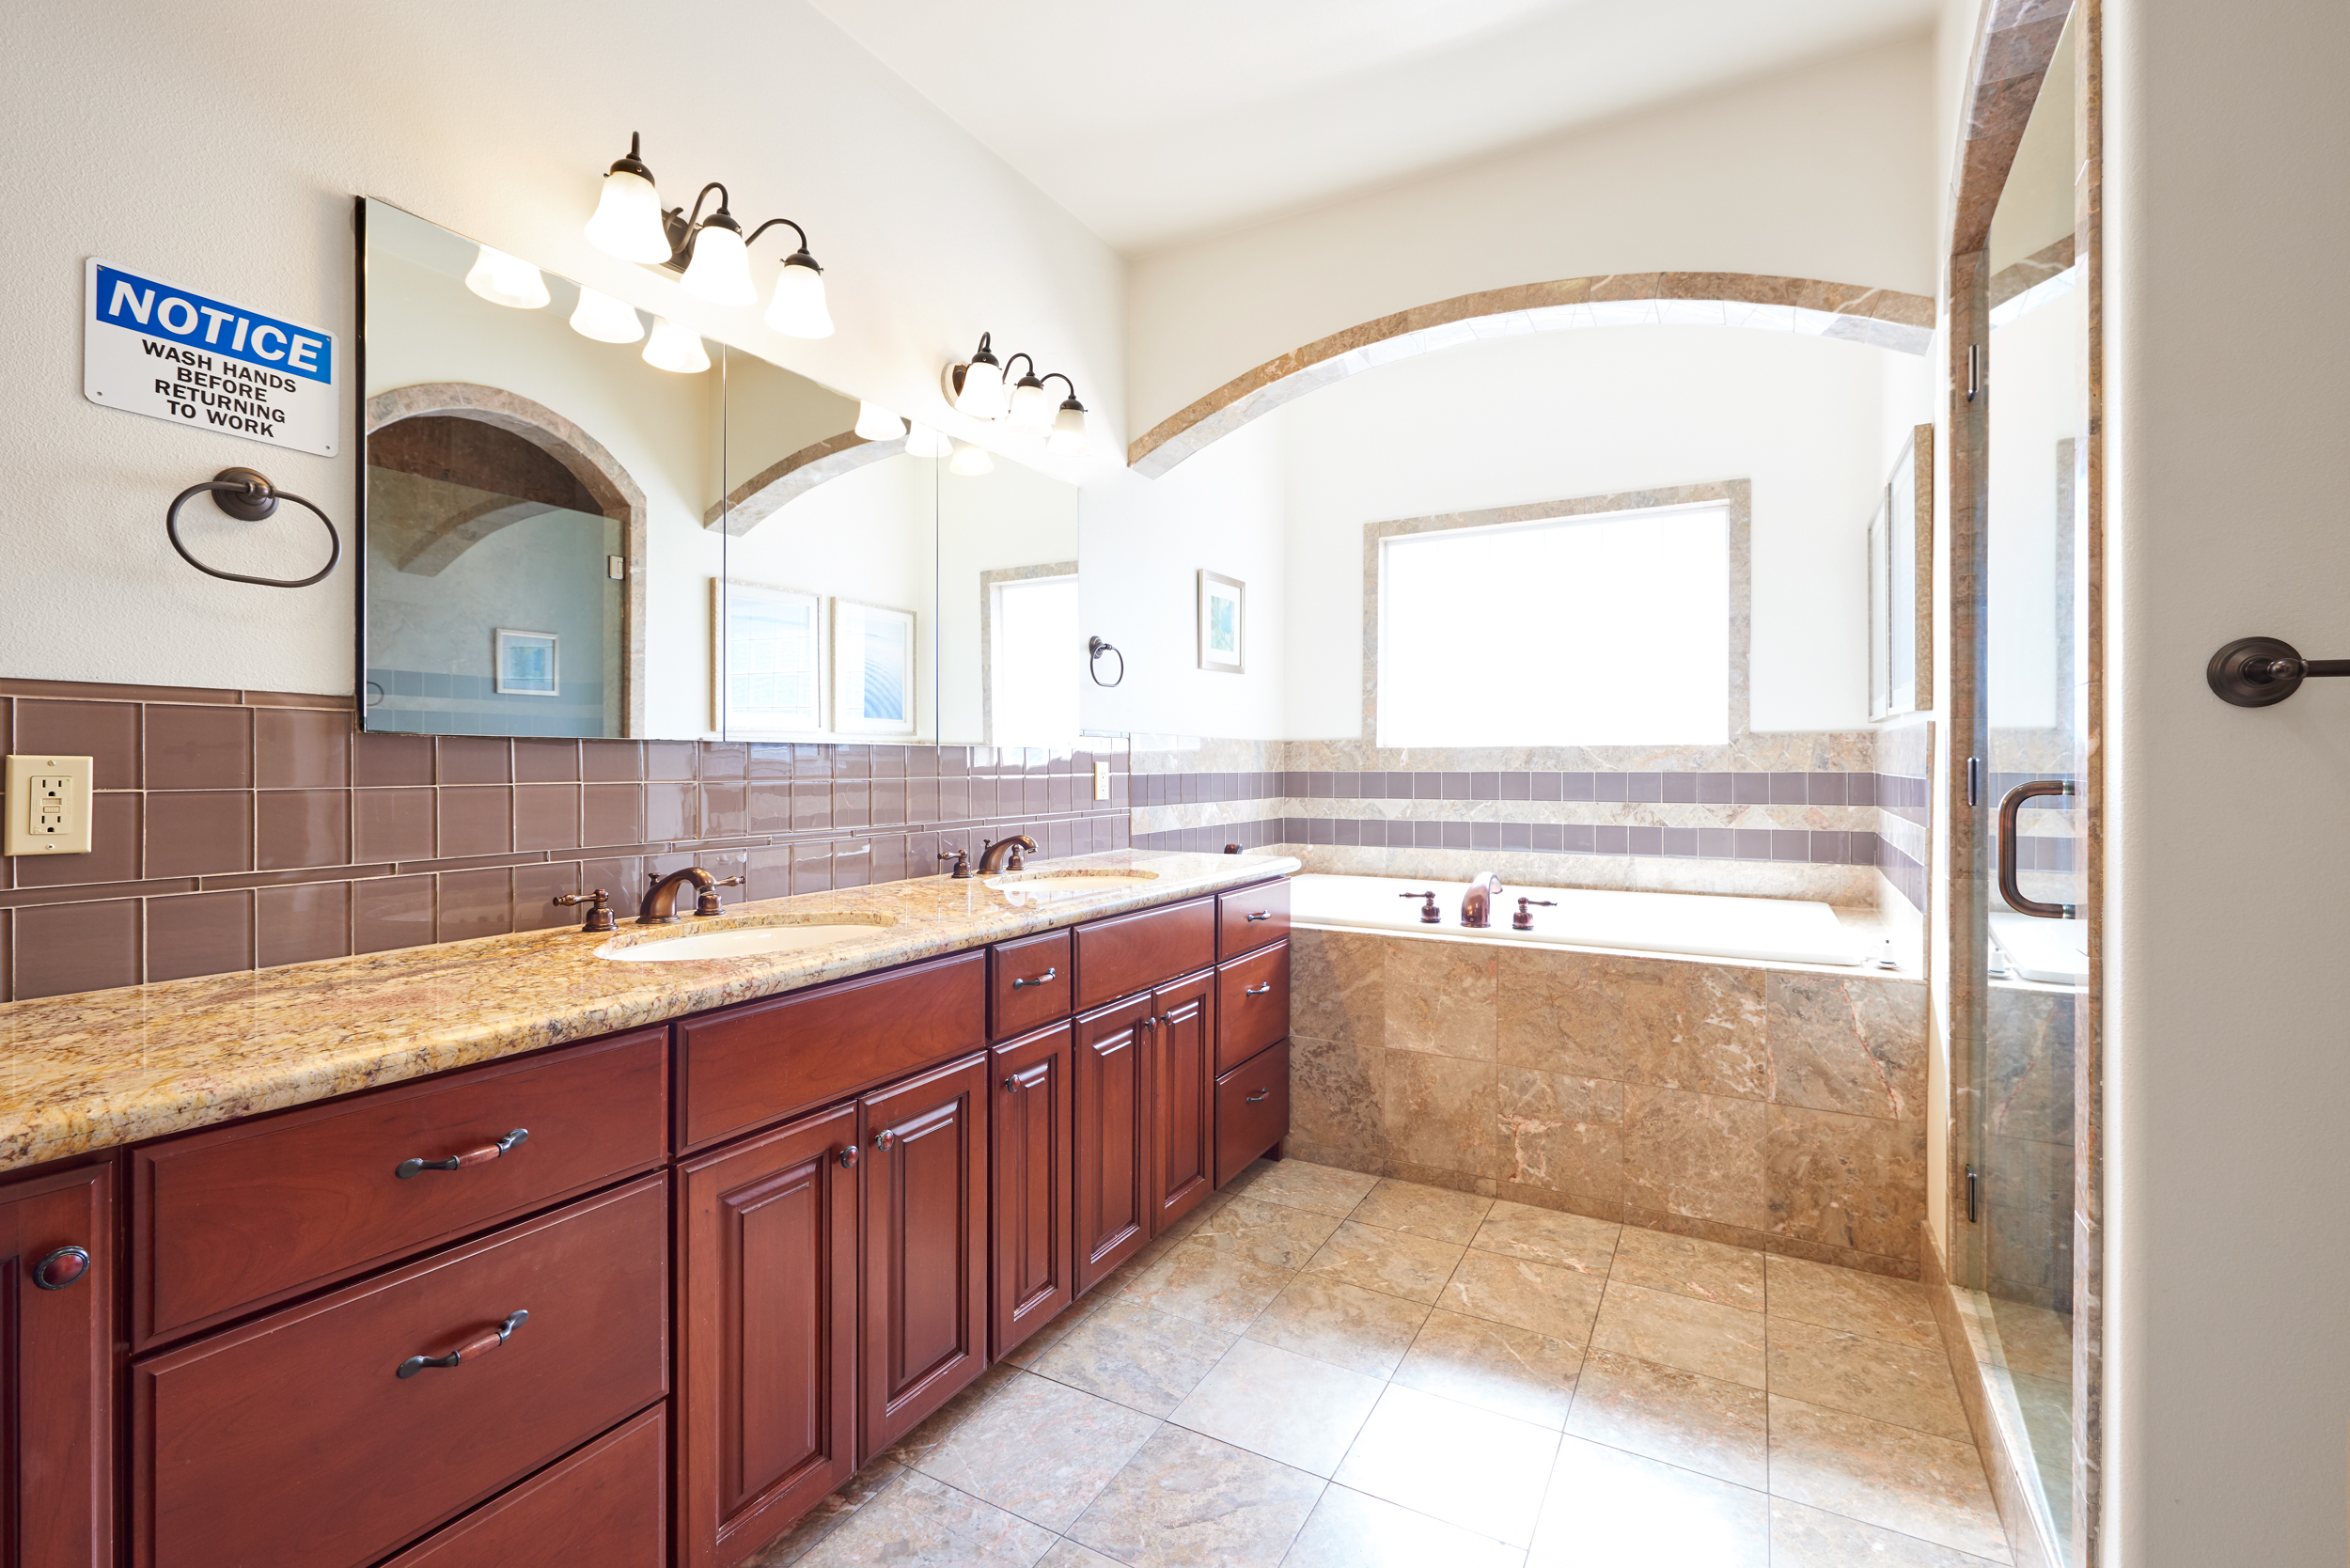 https://secureservercdn.net/198.71.233.107/zgw.2cd.myftpupload.com/wp-content/uploads/2020/08/Gratitude-Lodge-Long-Beach-Master-Bathroom.jpg?time=1607134972